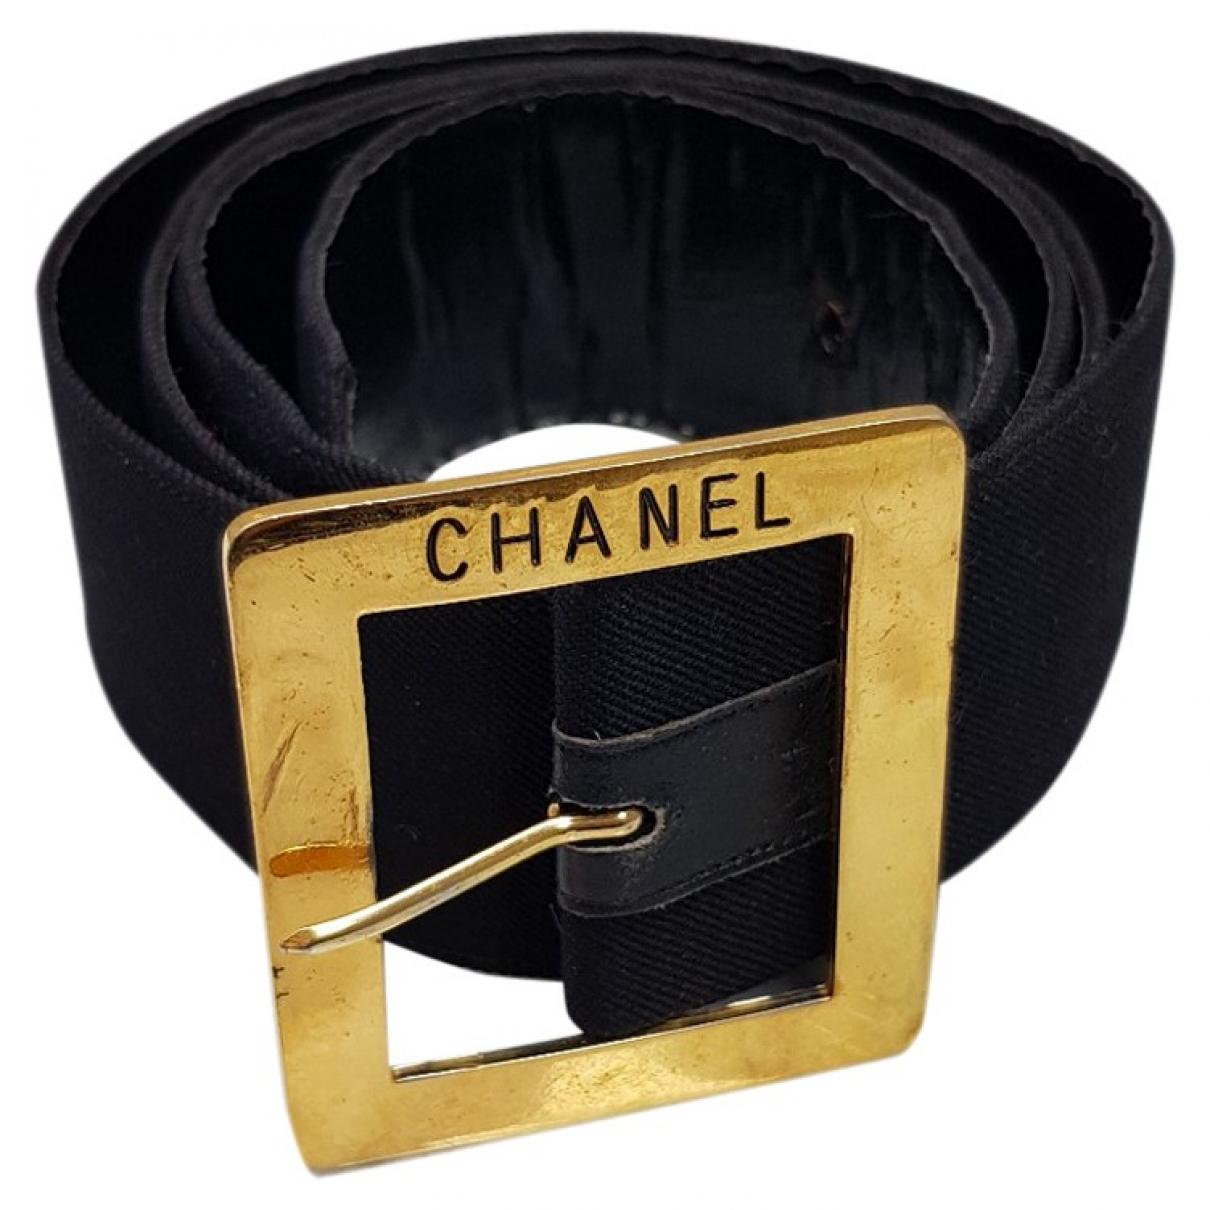 Chanel \N Black Cotton belt for Women 85 cm